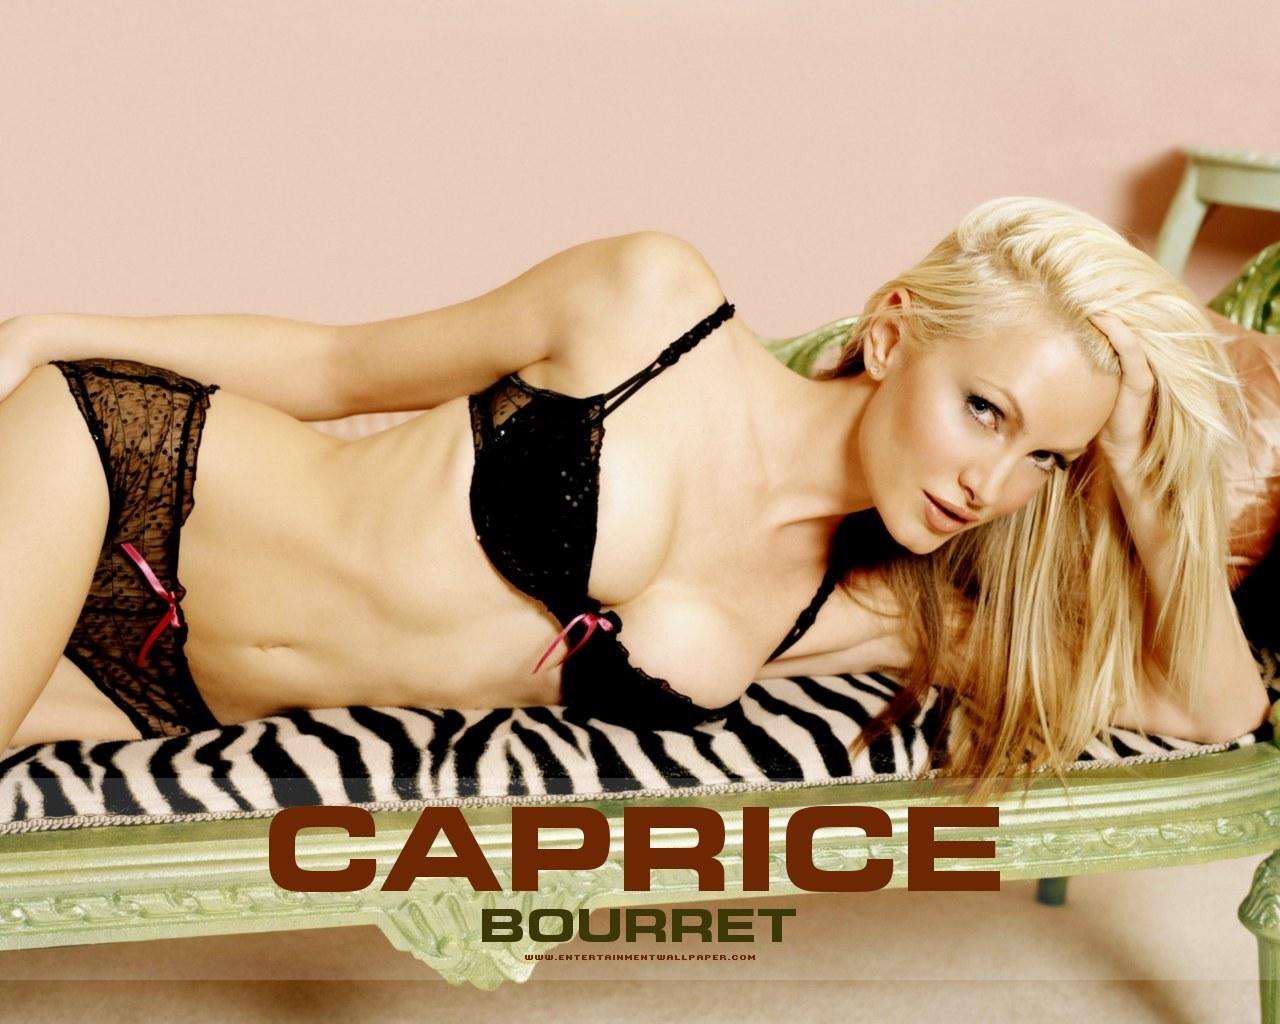 http://2.bp.blogspot.com/-kmqOmEoHQsc/UCyHPNyJwrI/AAAAAAAAAH8/YCFyfjZrexs/s1600/Caprice-Bourret-Latest-HD-Wallpapers-super-super-Preety-Hollywood-Actress-Black-White-Bikini-Dress-Big-Boobs-Figure-Bra-Blue-Pent.jpg